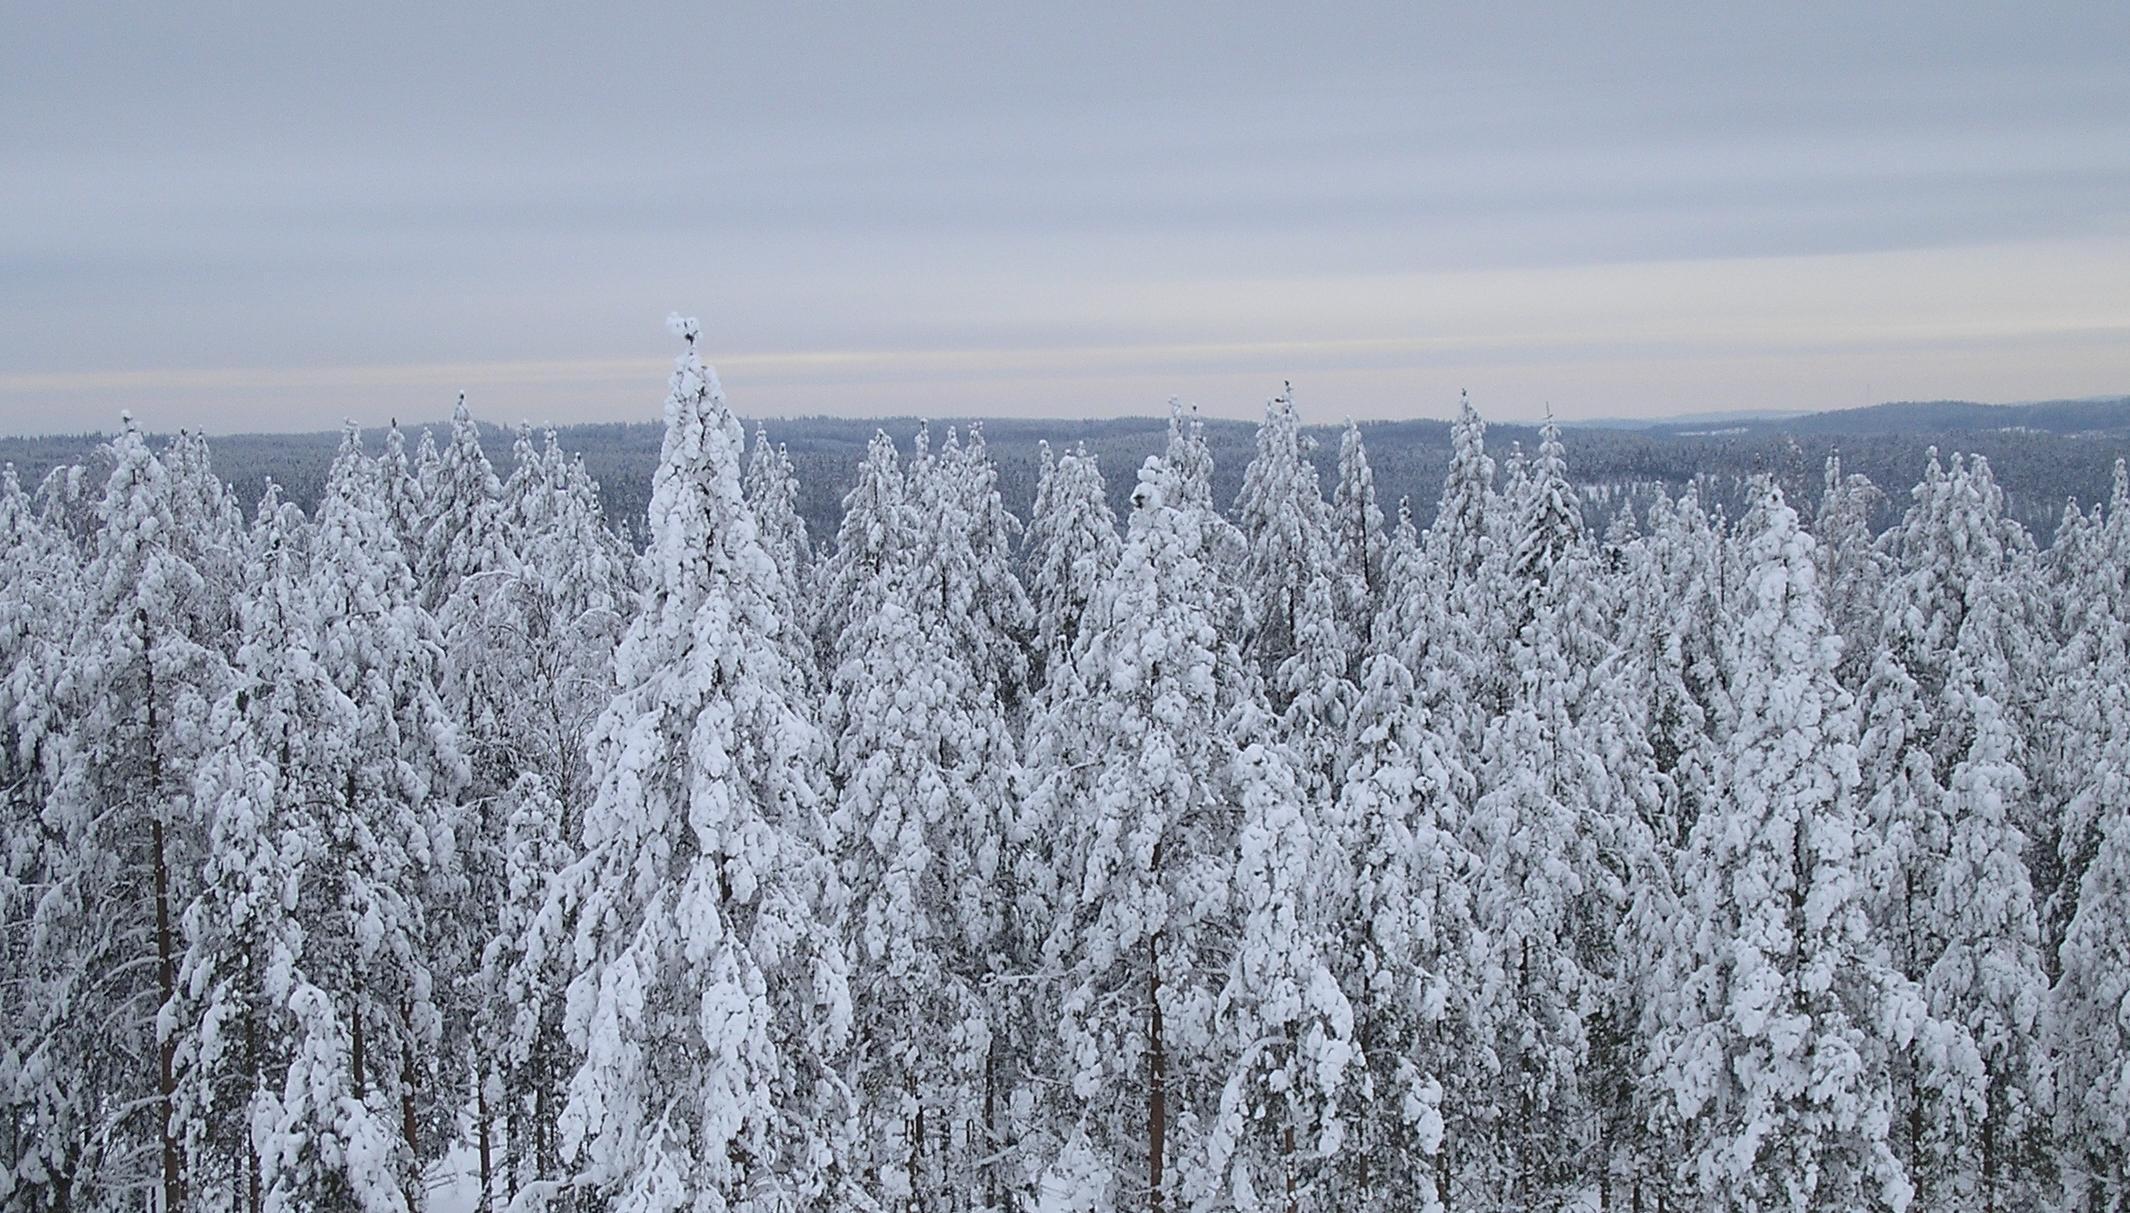 Winter Finland by Lumituisku